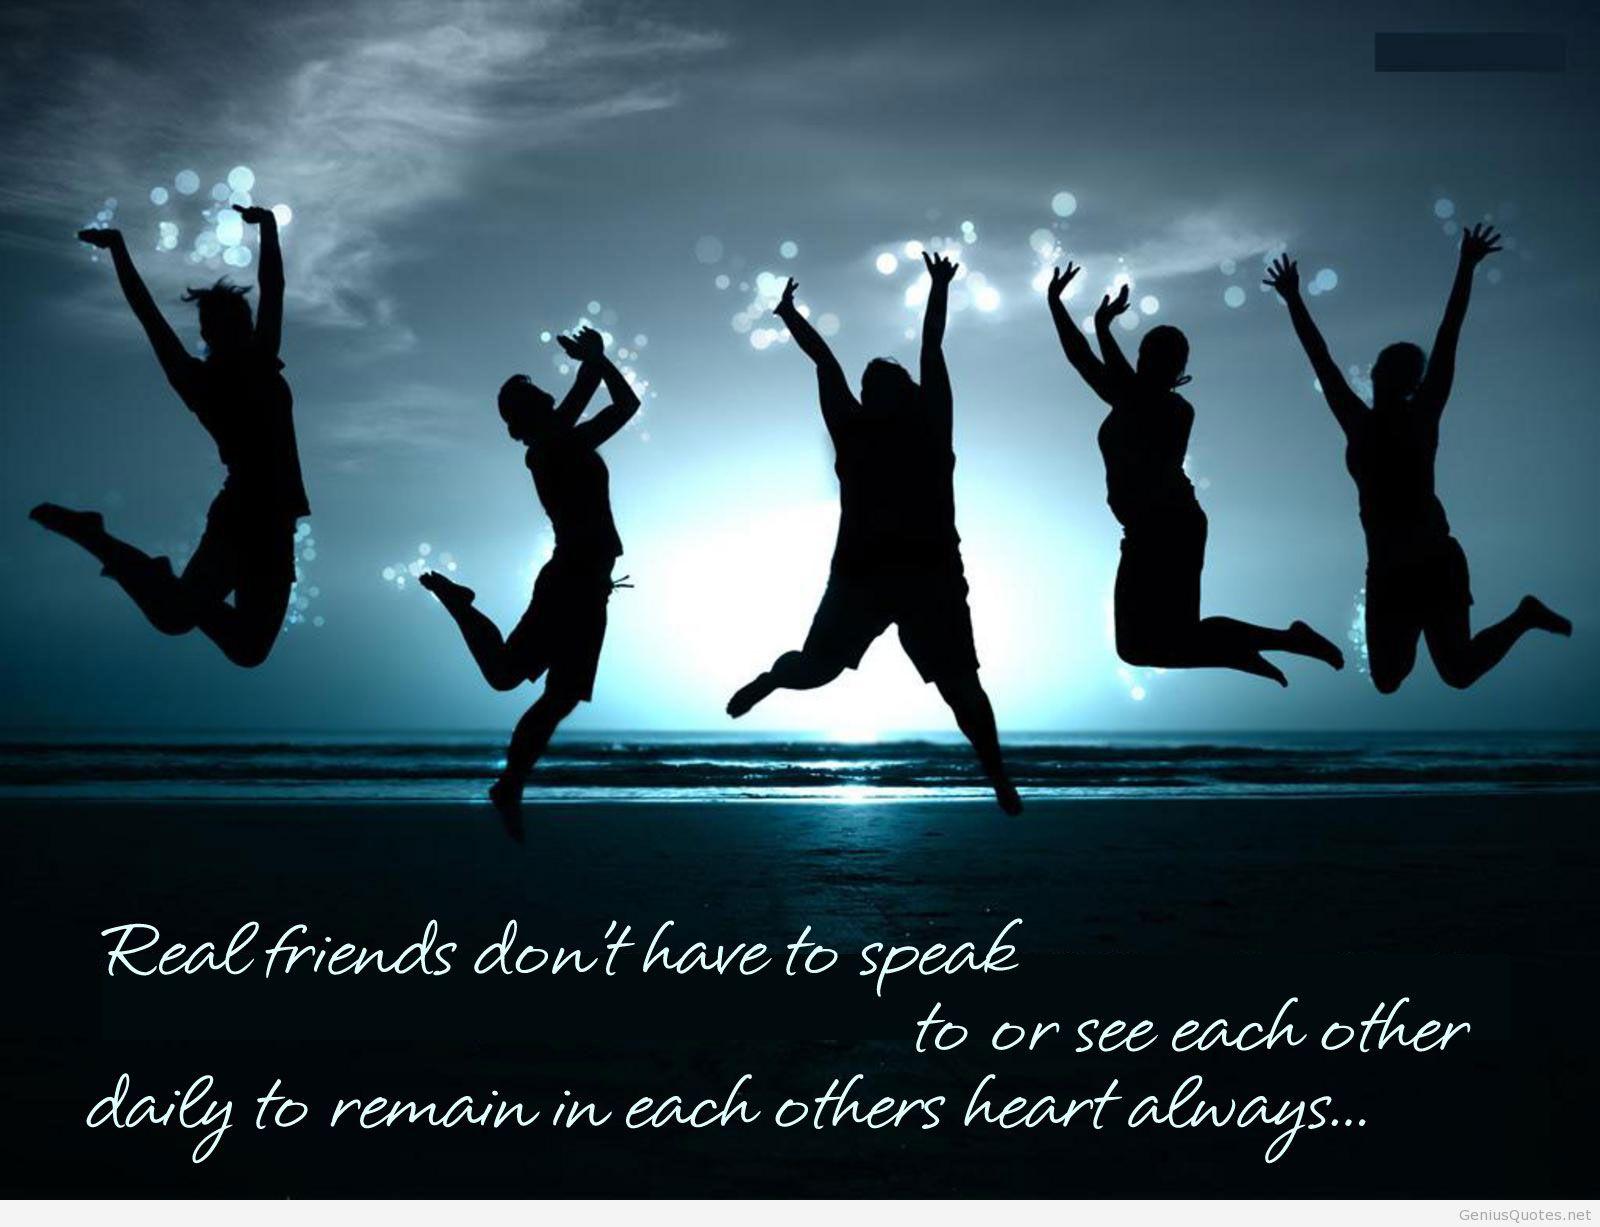 NARUTO Gambar Persahabatan Lengkap